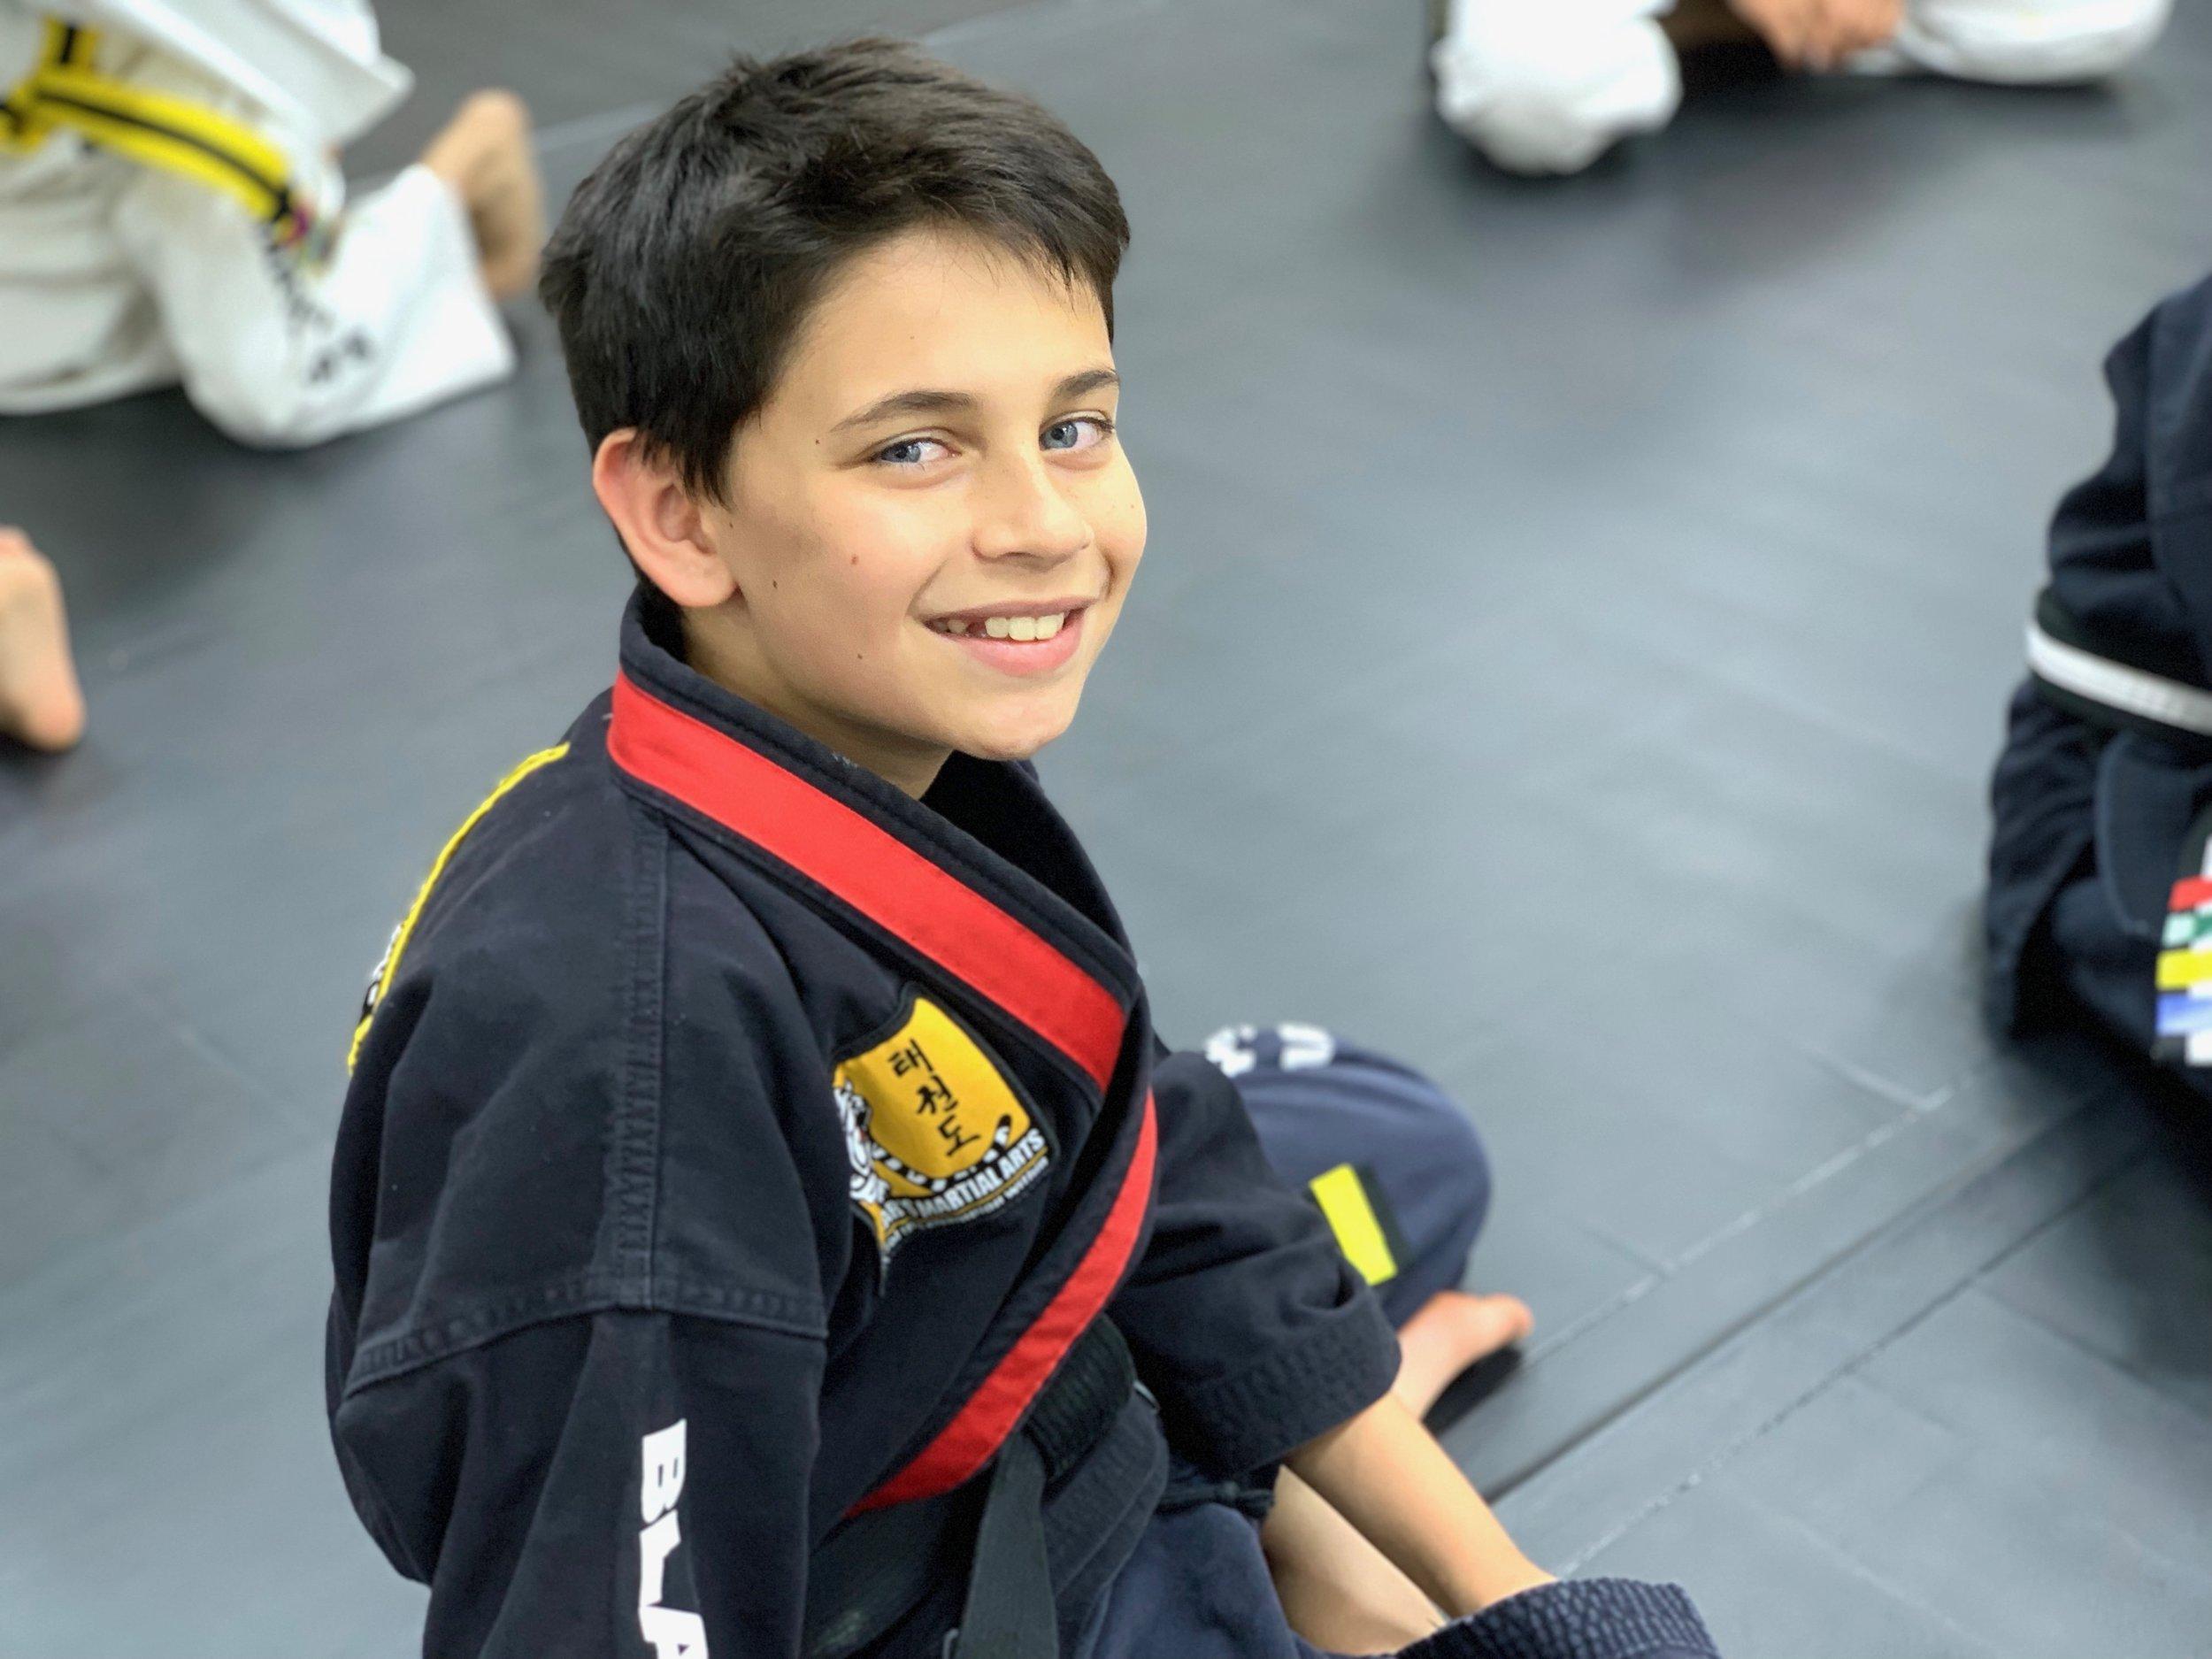 karate-kids-program-souhtlake-keller-grapevine-texas00020.jpeg